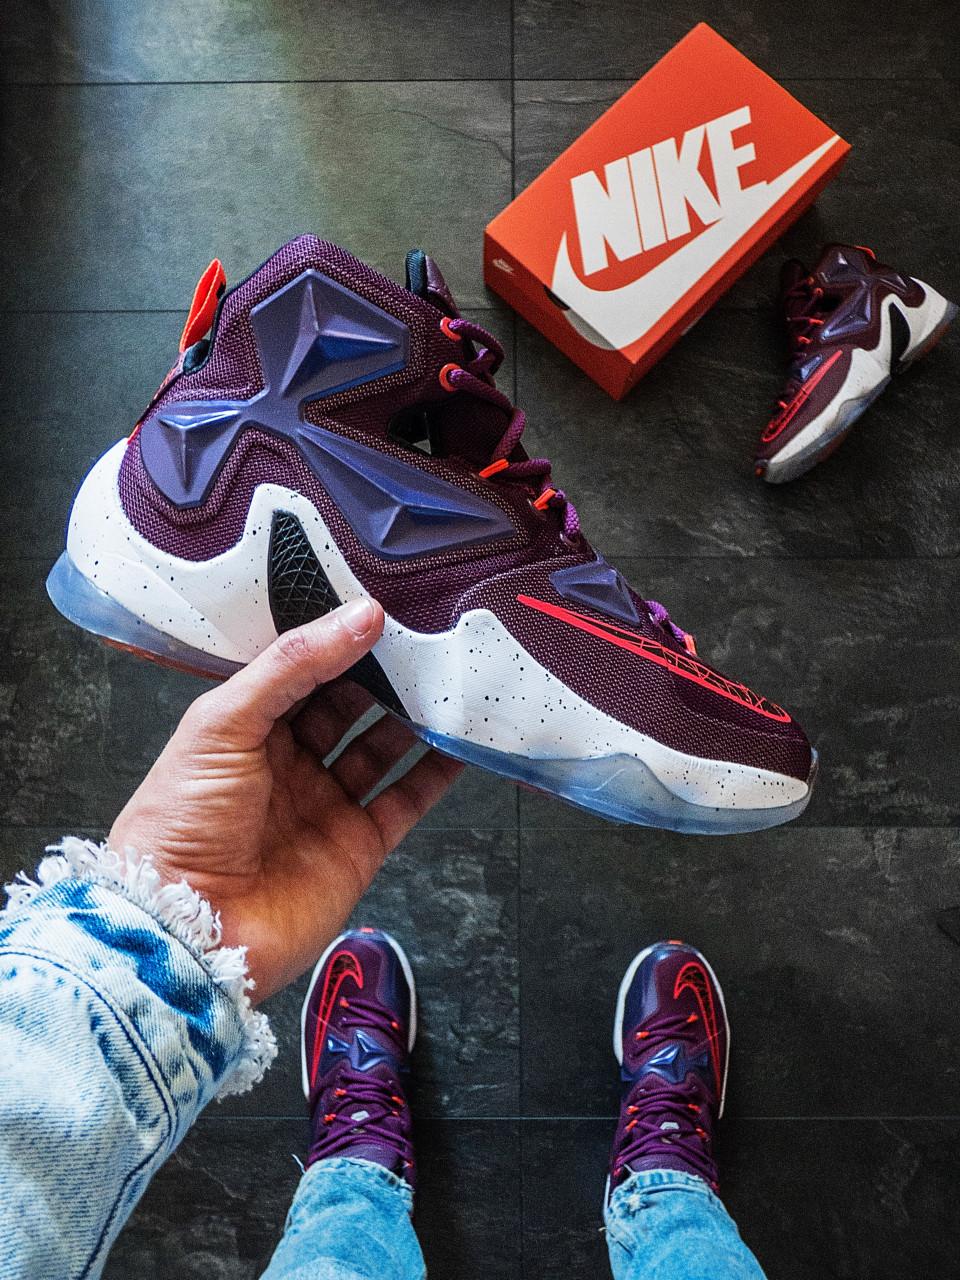 Баскетбольные кроссовки NIKE LEBRON 13 Perfomance 44 размер